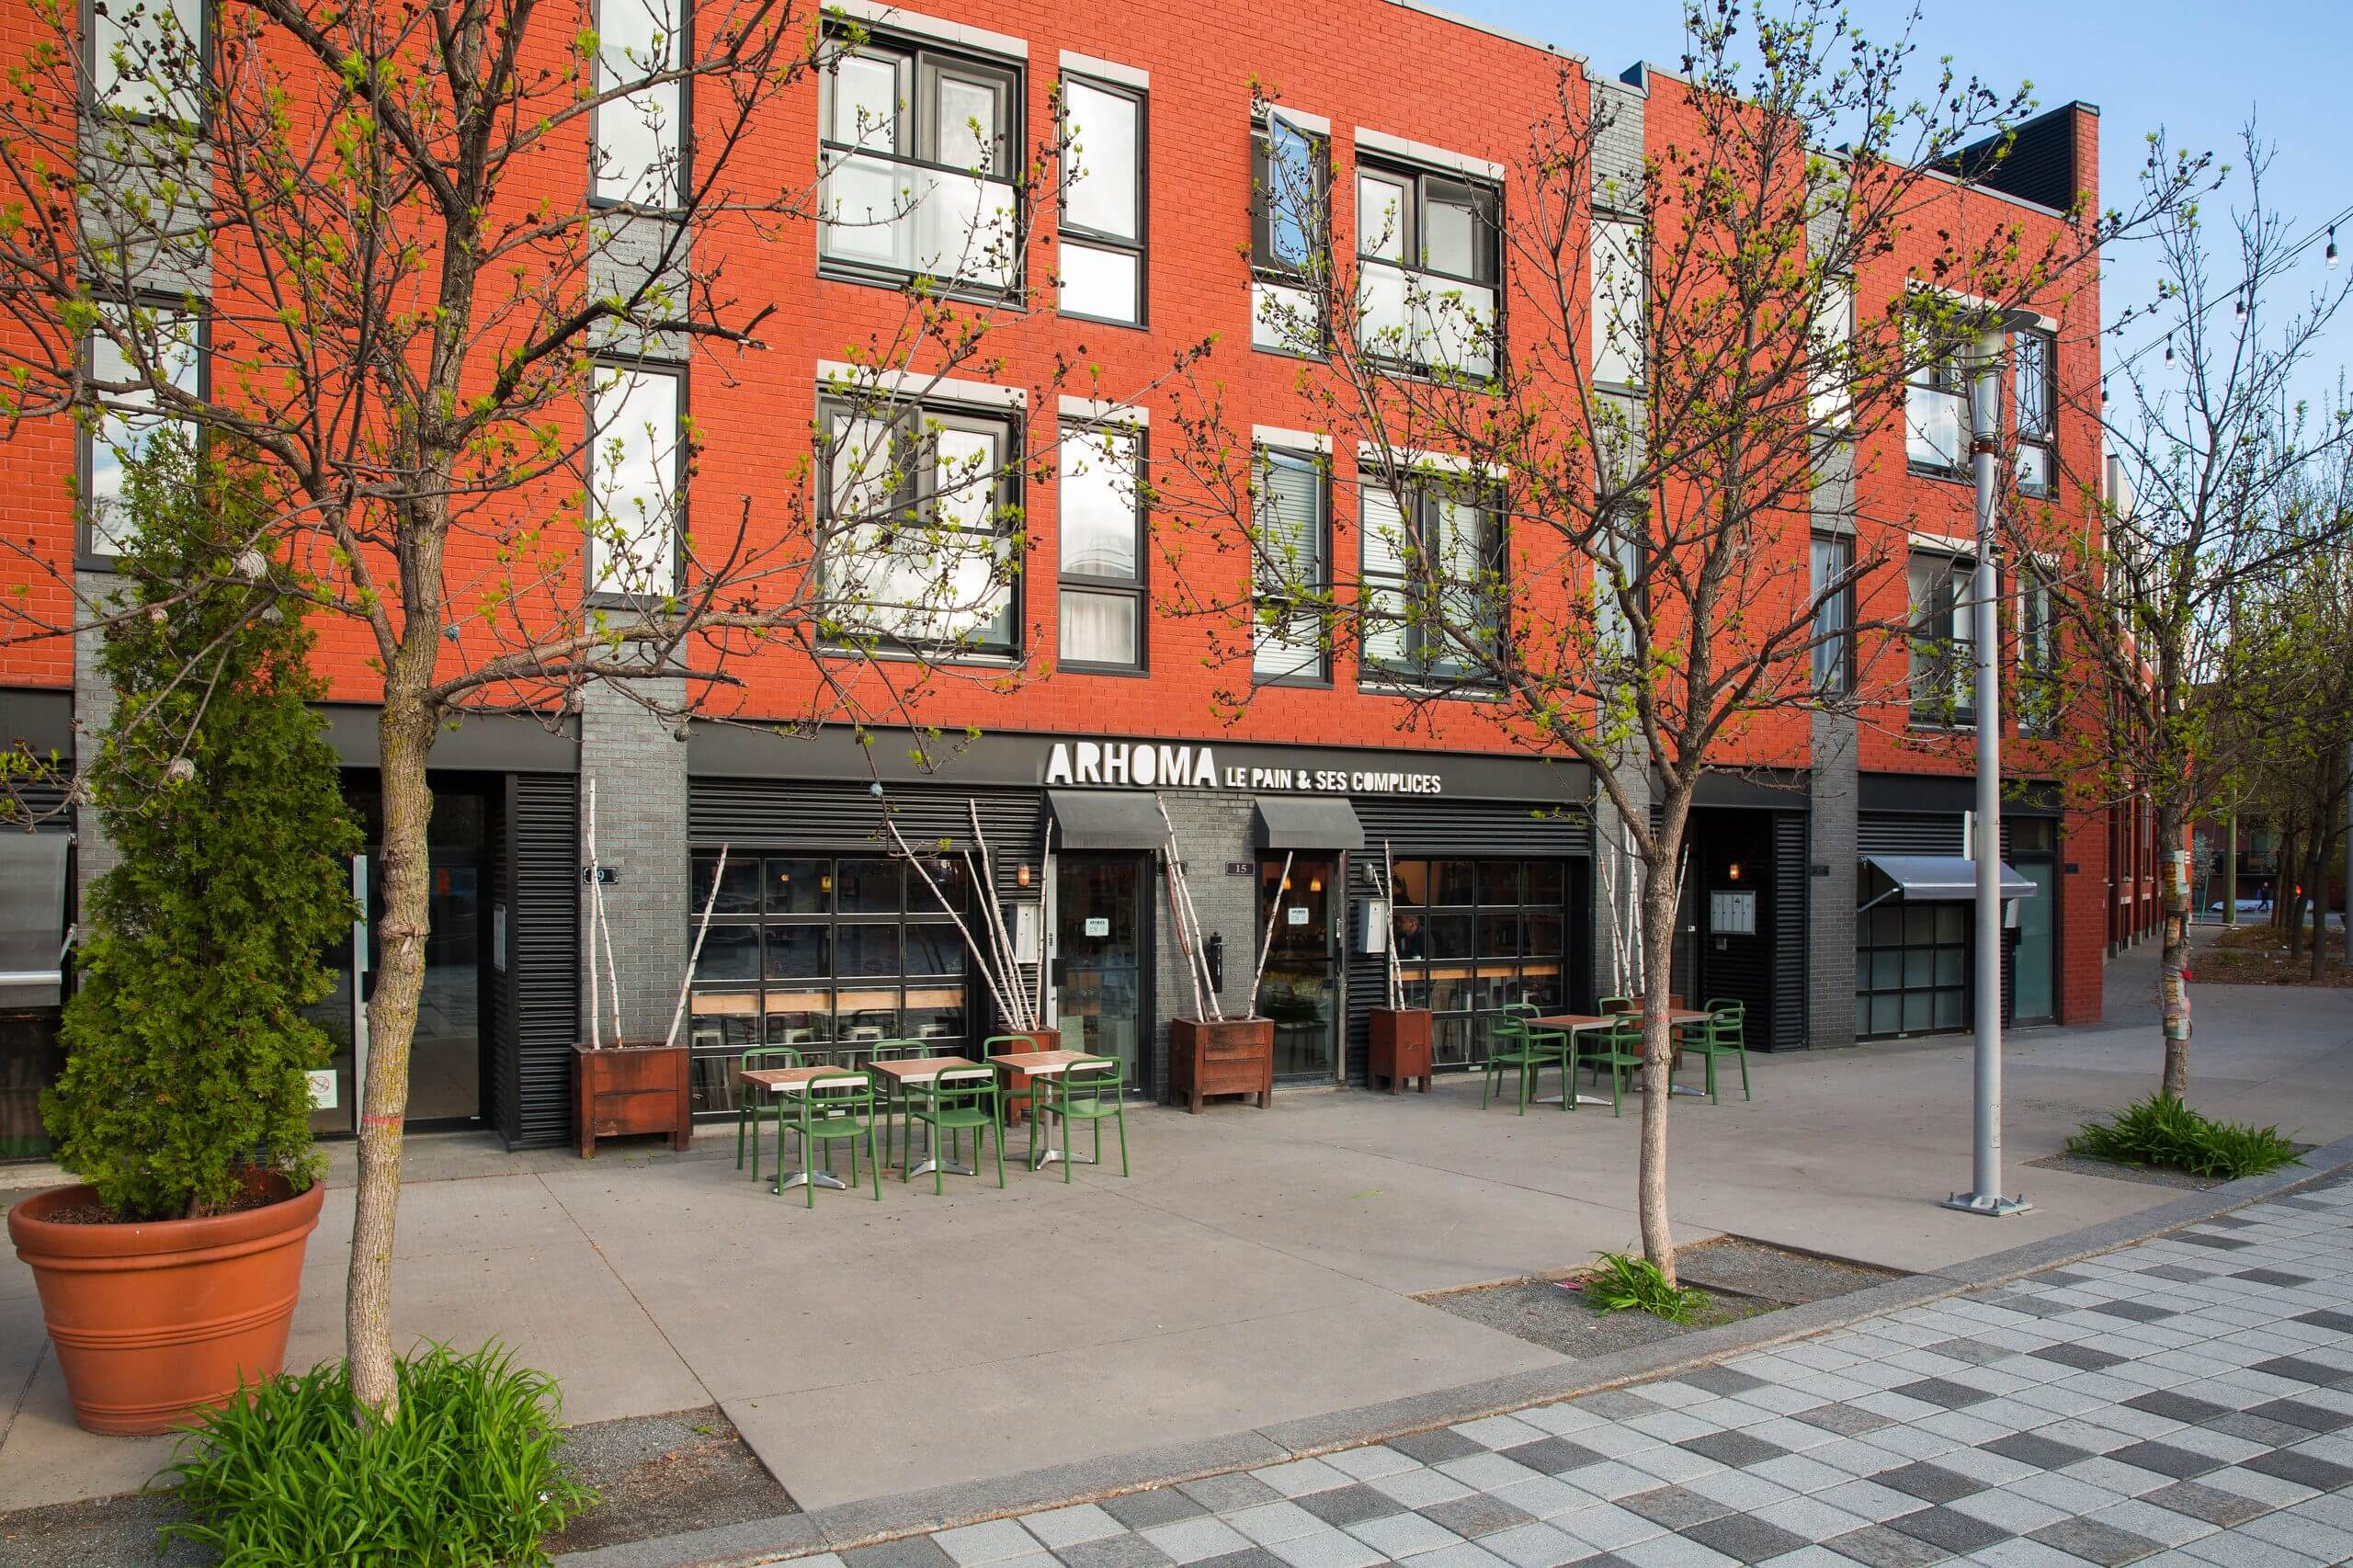 Boulangerie Arhoma Boutique